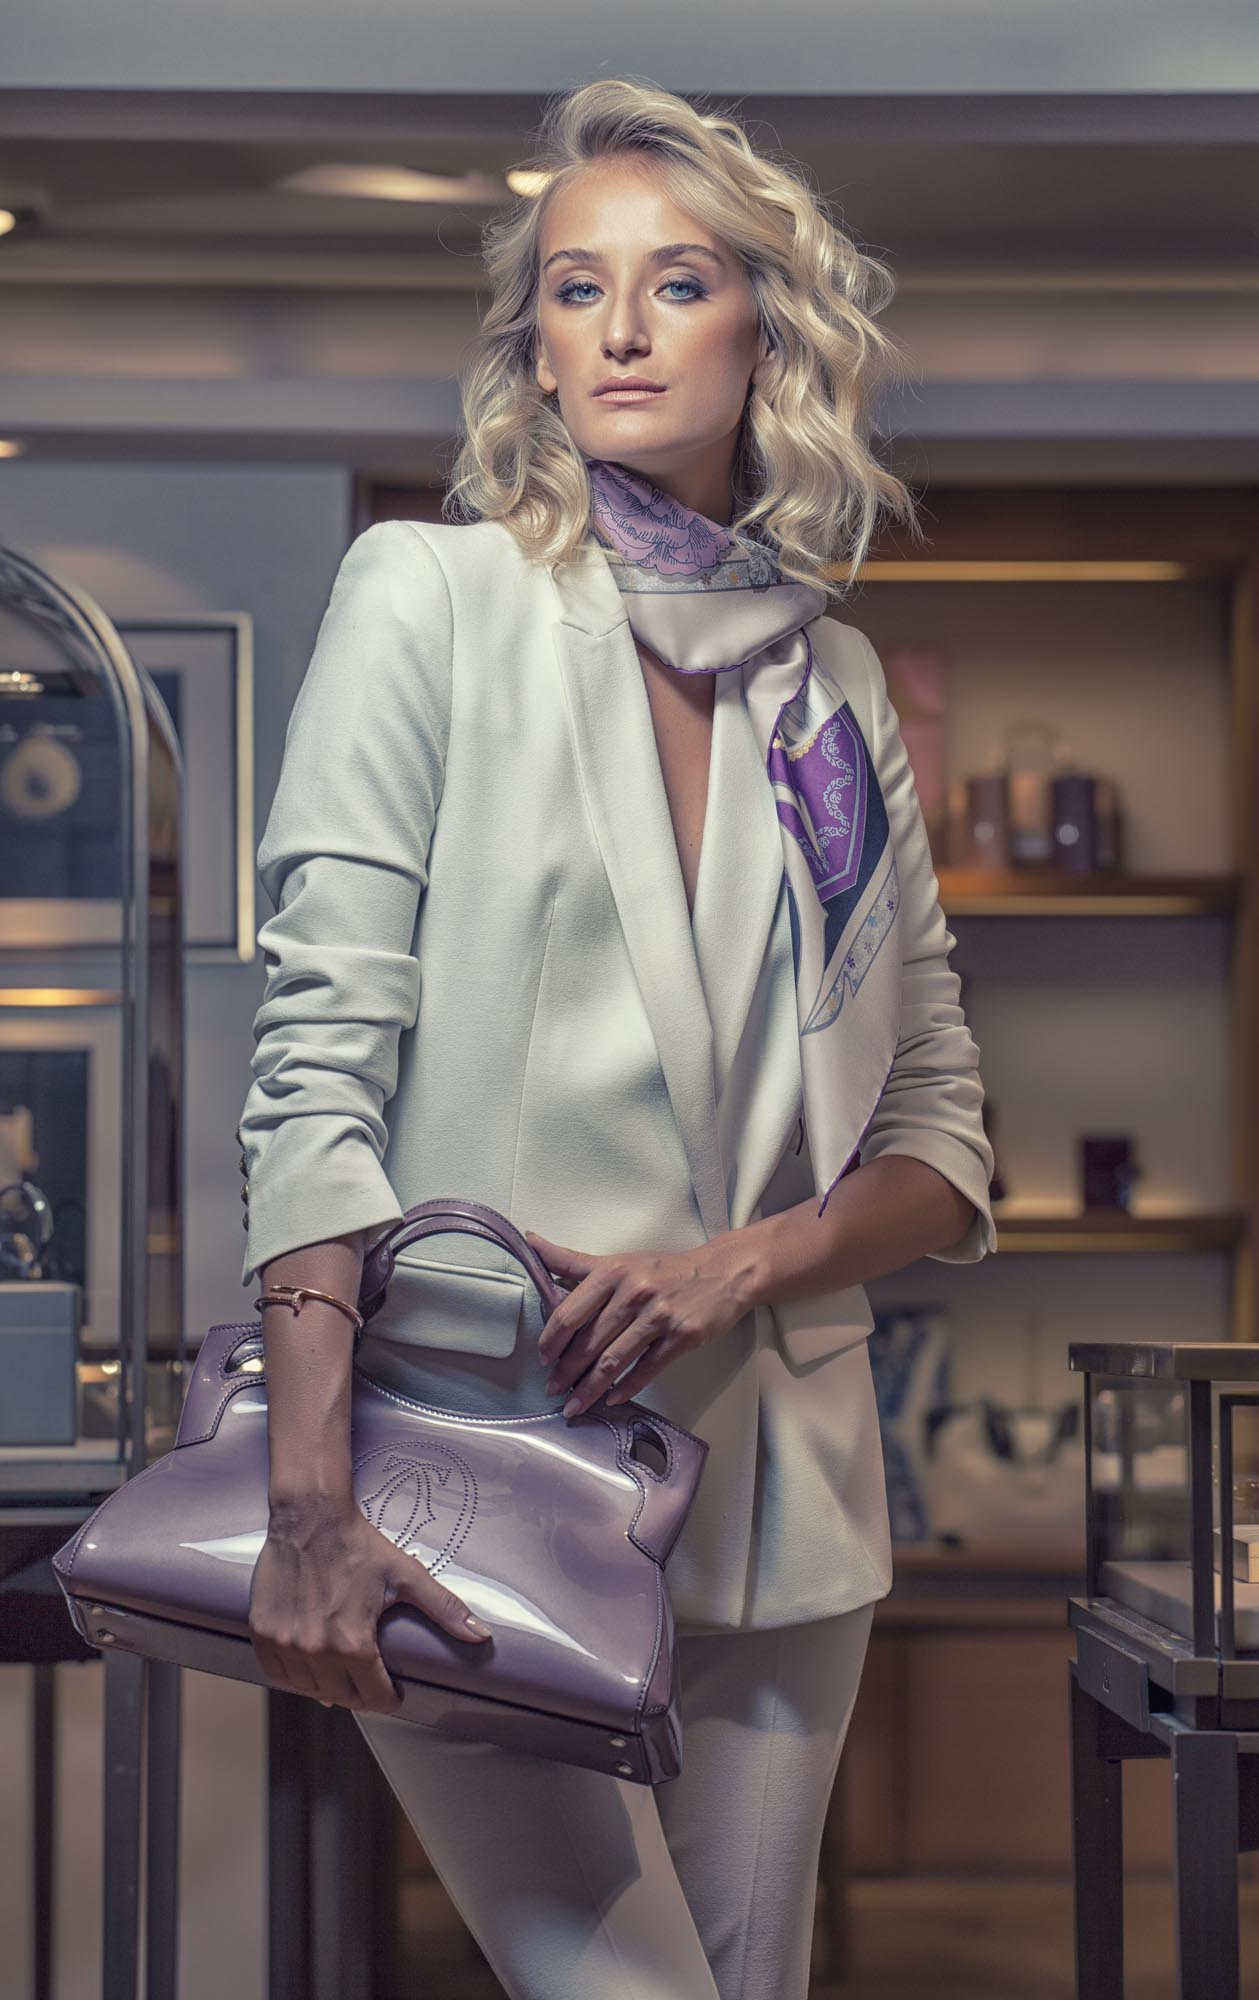 Cartier_Fashion_Bag_005.jpg